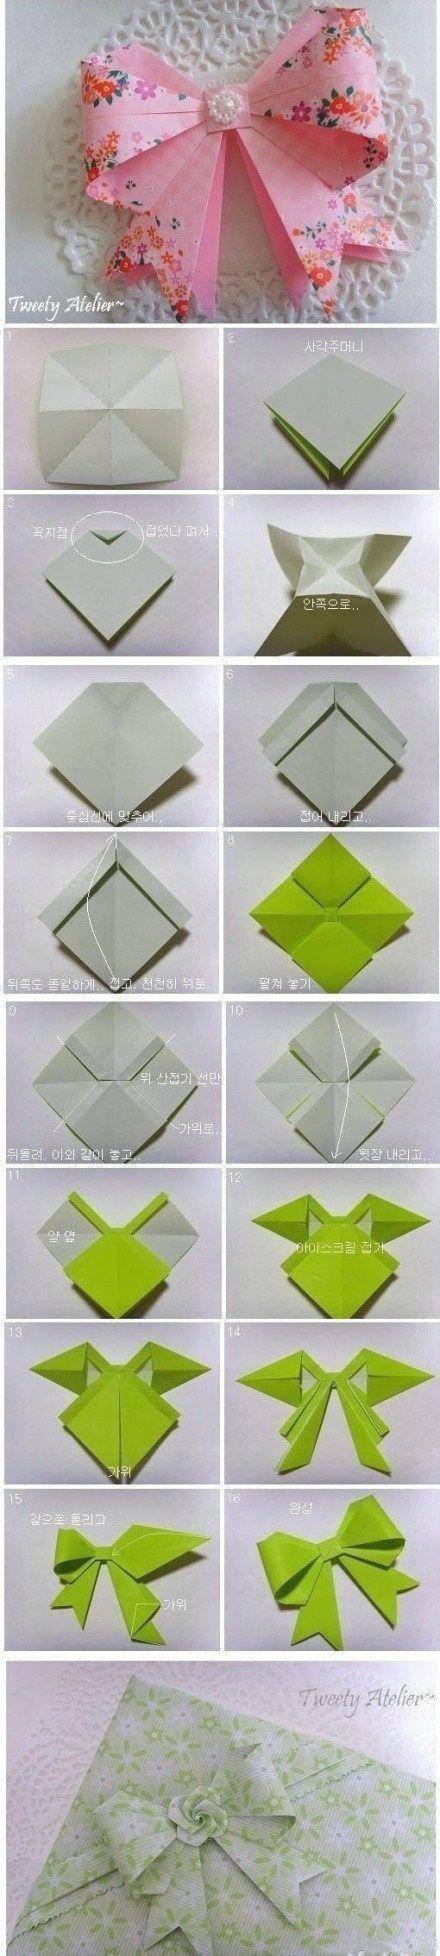 origami fiyonk yapımı